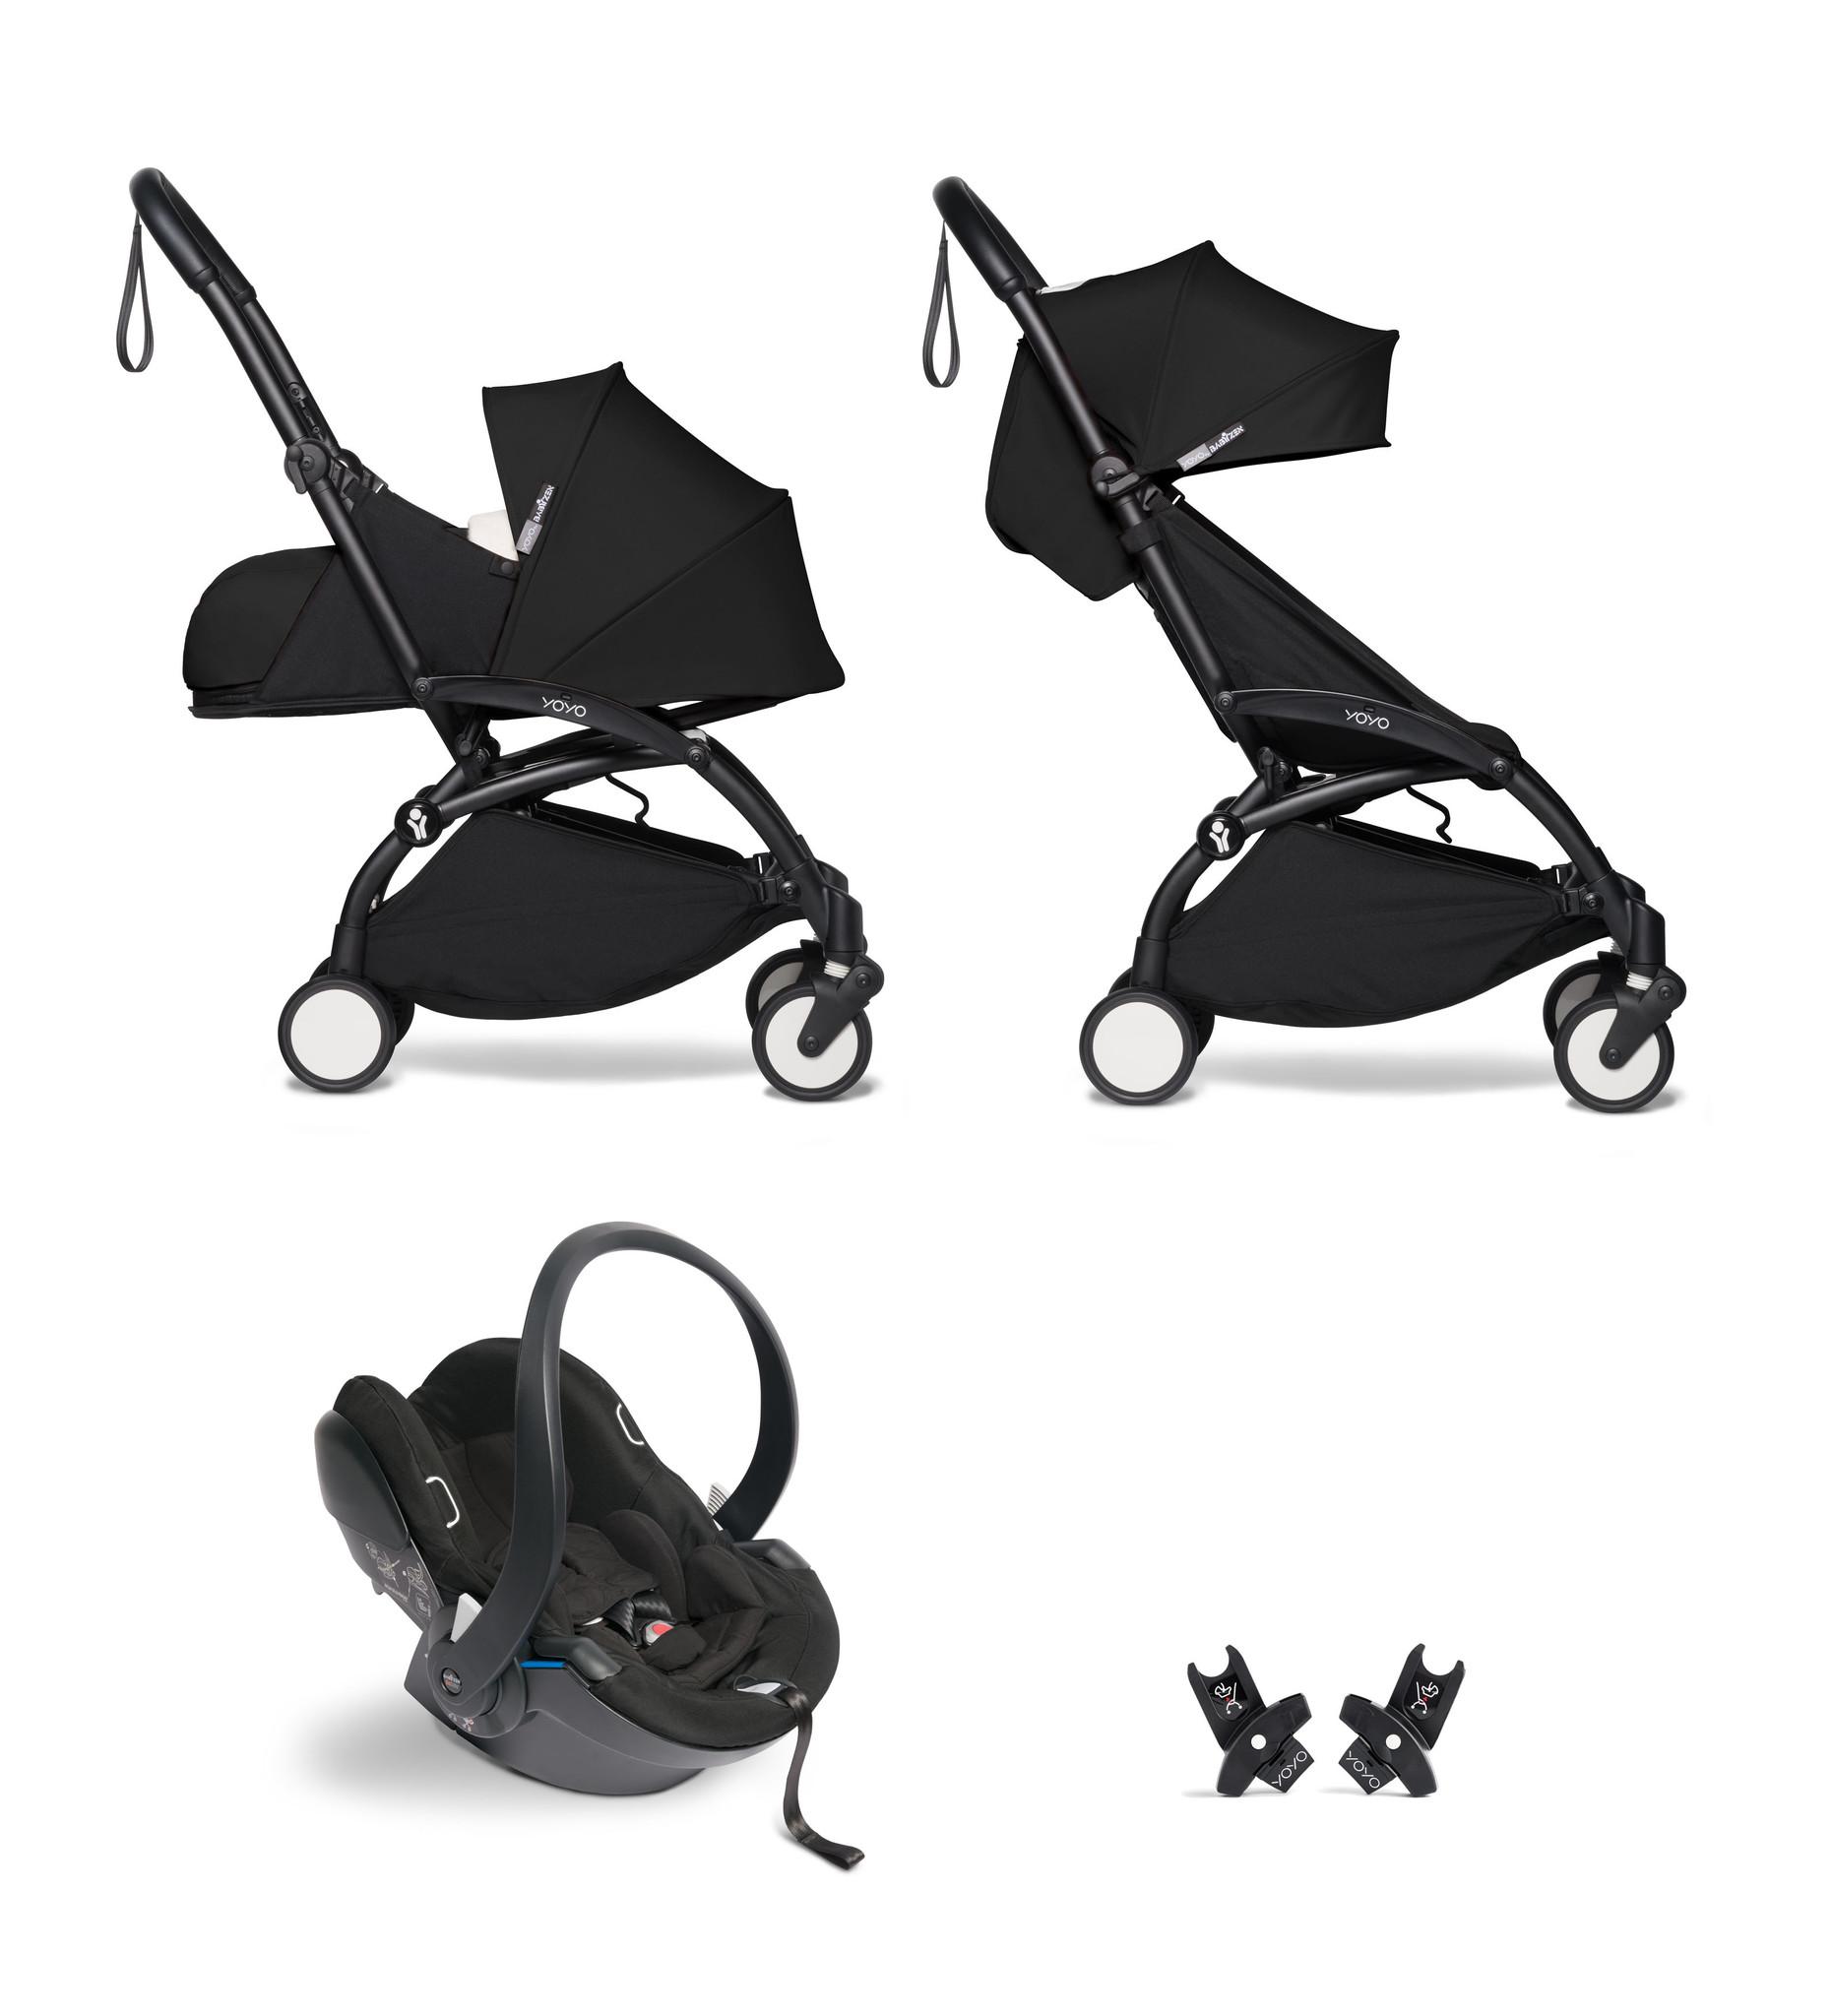 Babyzen YOYO² buggy COMPLEET / FULL SET 0+ and 6+ zwart frame zwart incl. YOYO² BeSafe autostoel zwa